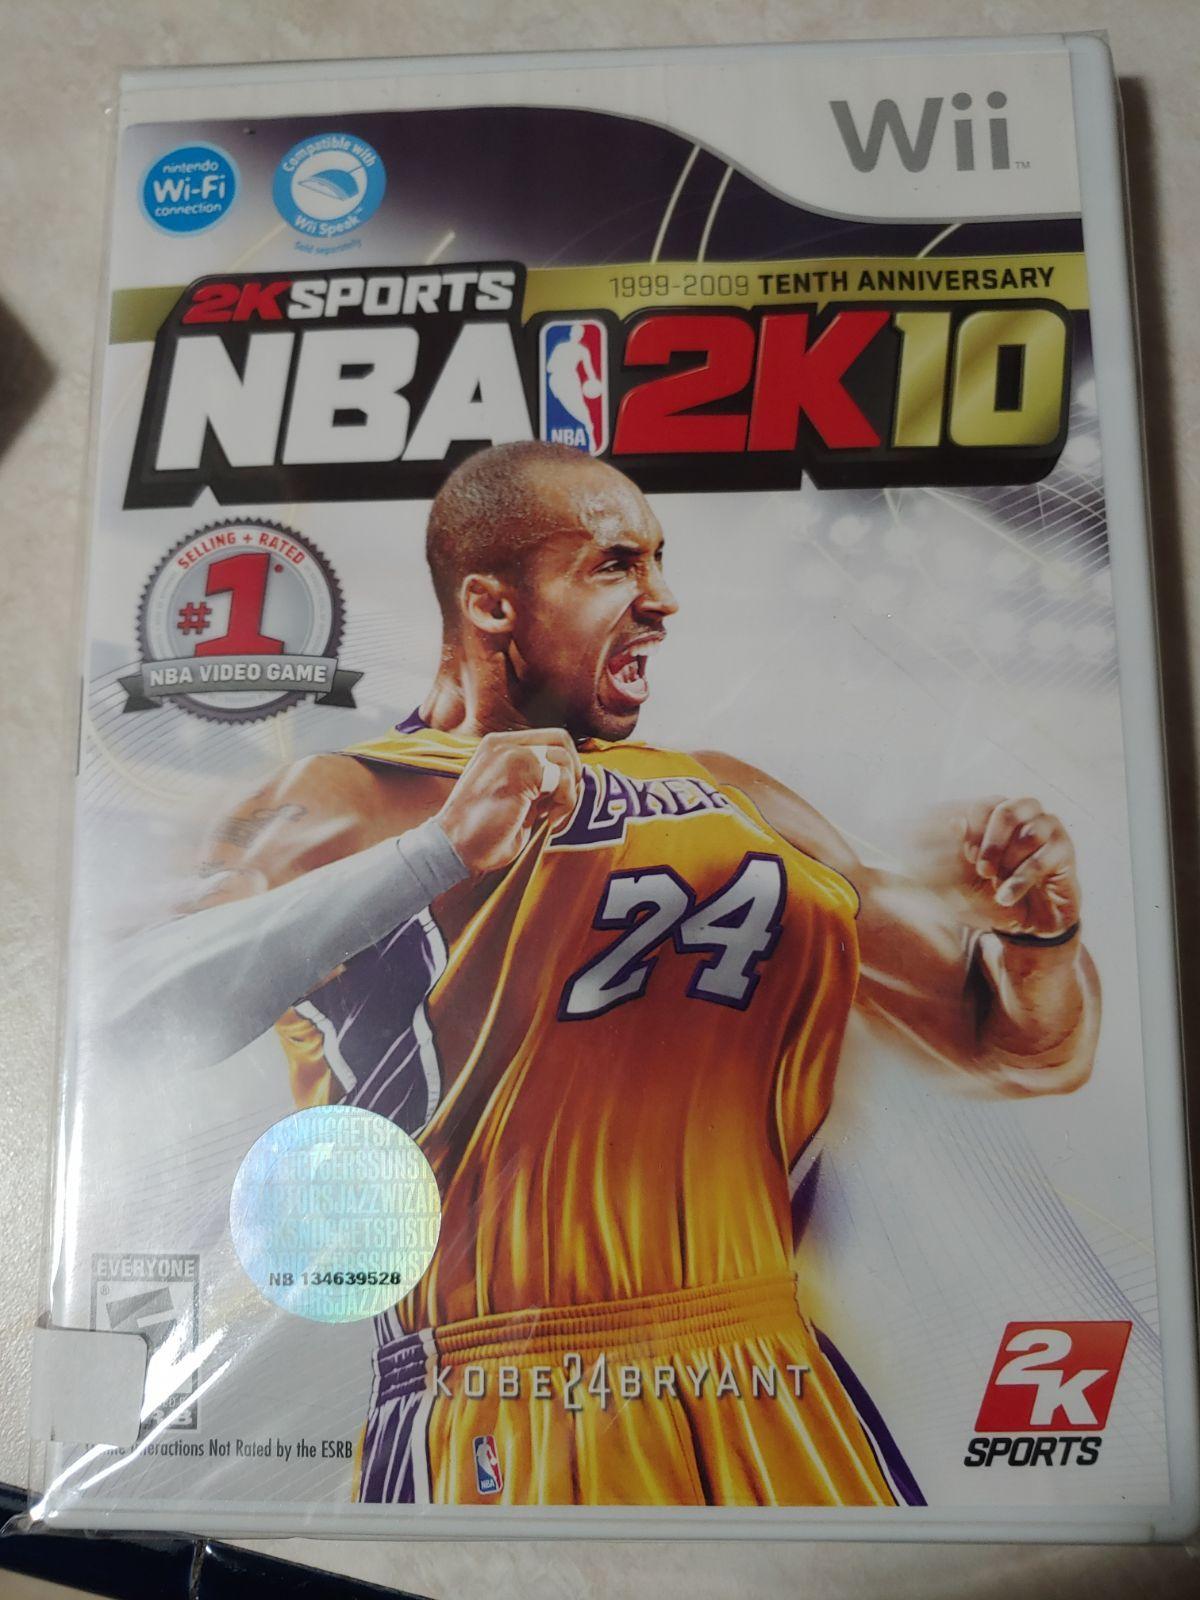 Wii NBA 2K 10 featuring Kobe Bryant